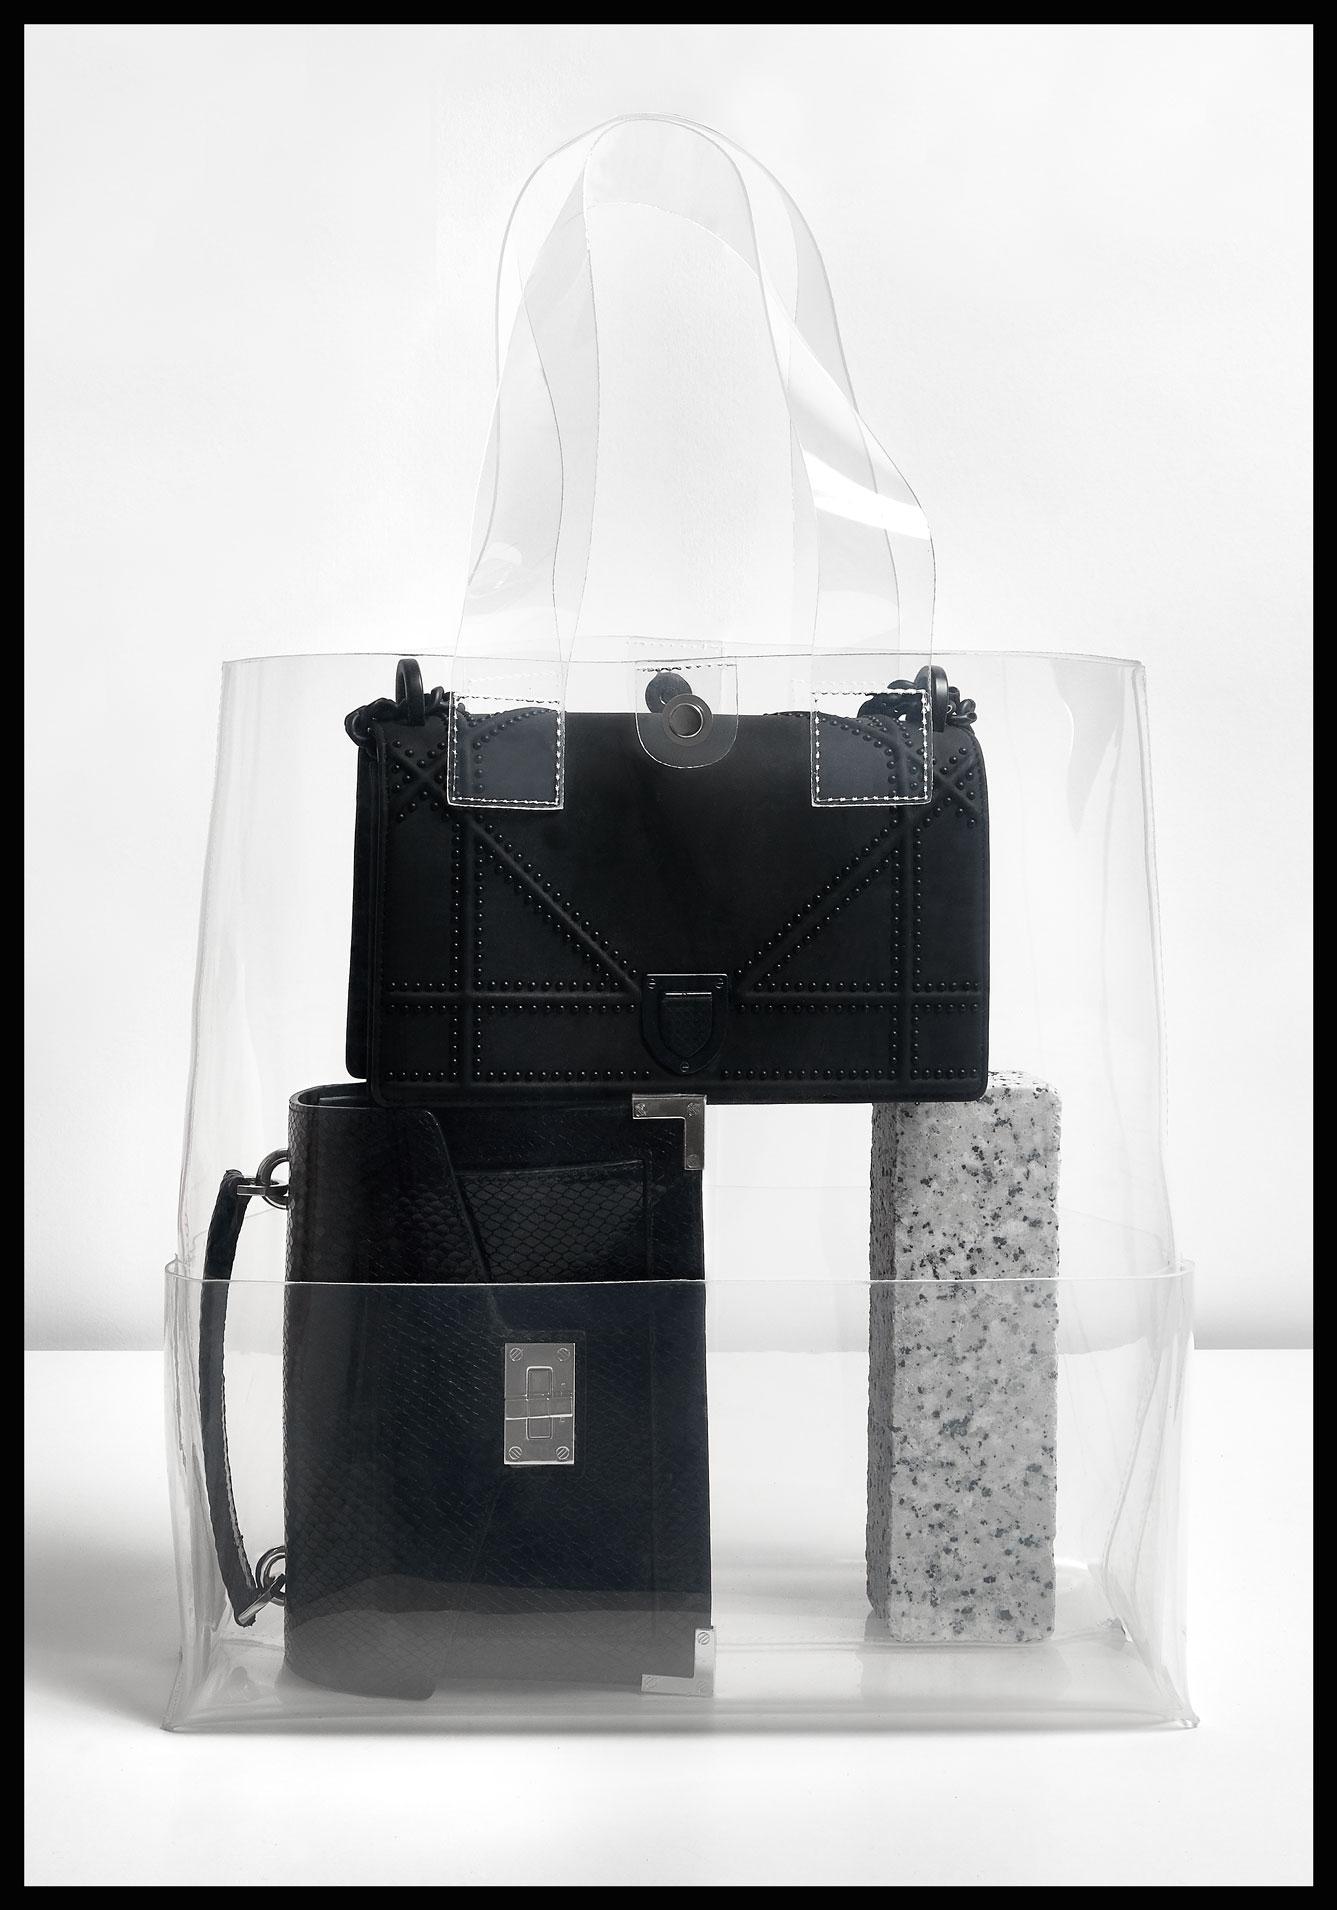 Bolso transparente, Zara. Bolso de pitón negro, The Kooples. Bolso 'Diorama', Christian Dior.